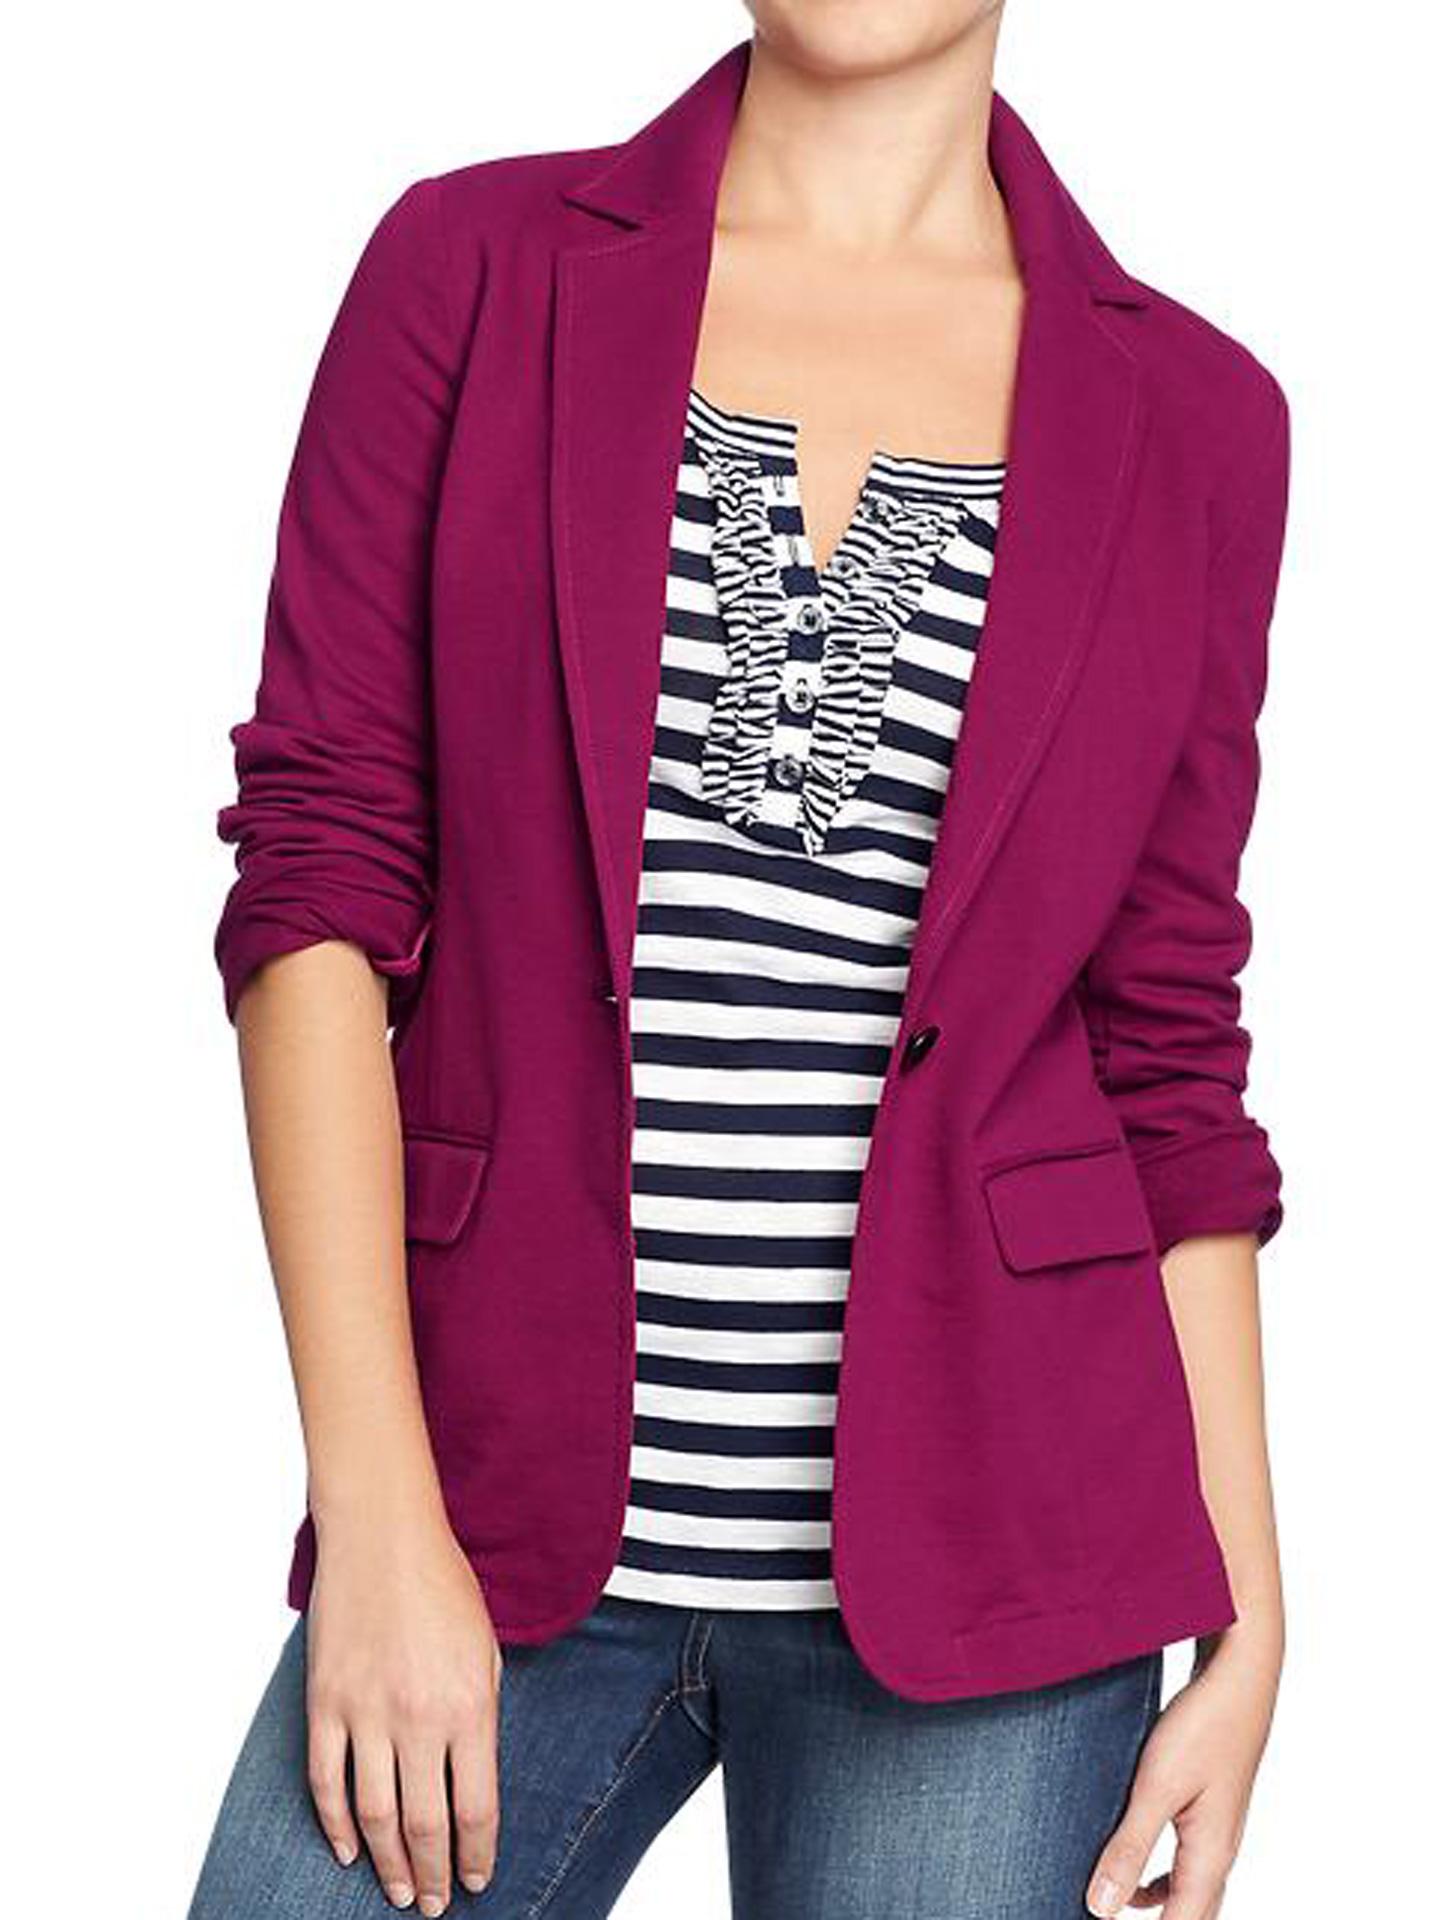 Blazers For Men Pinterest: 18 Spring Jackets Ror Girls- Spring Jackets For Teens